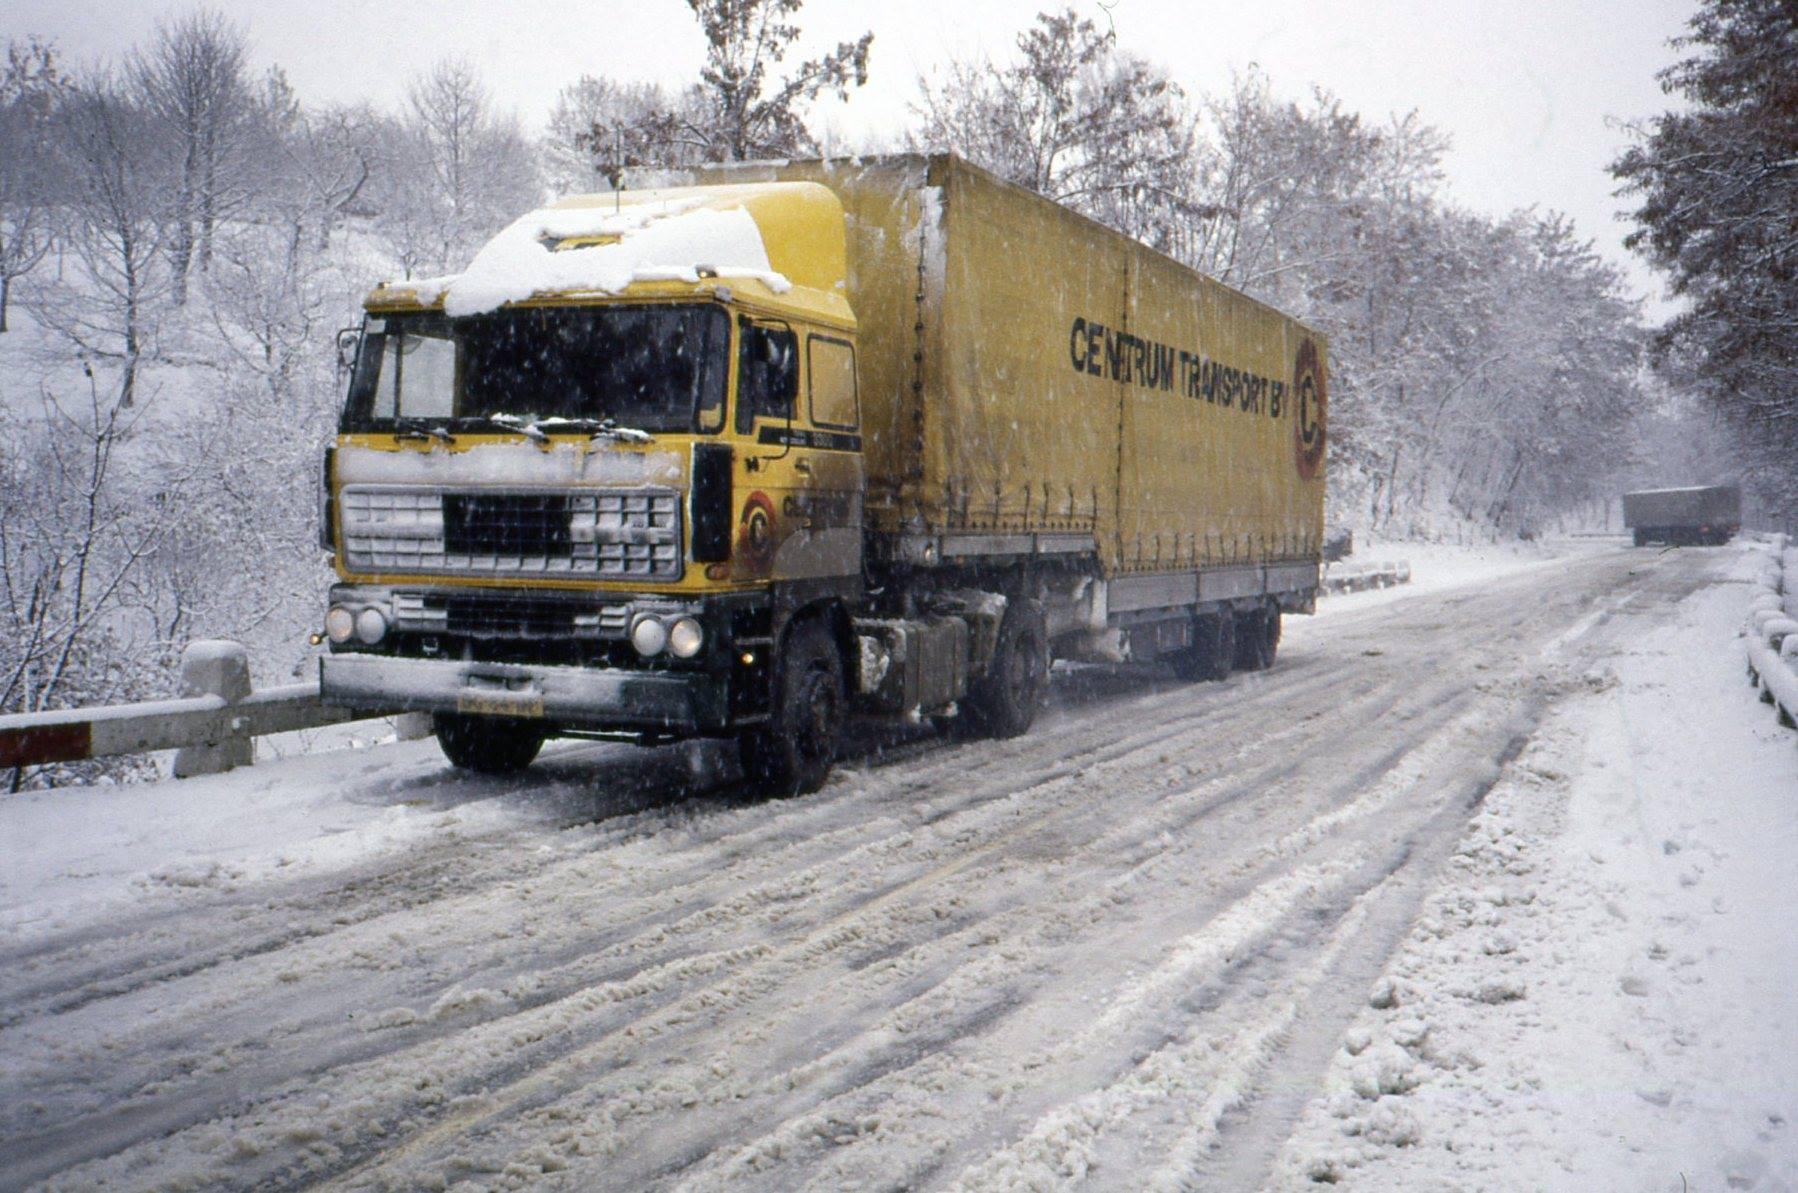 Hans-Anthonise-midden-oosten-transport-31